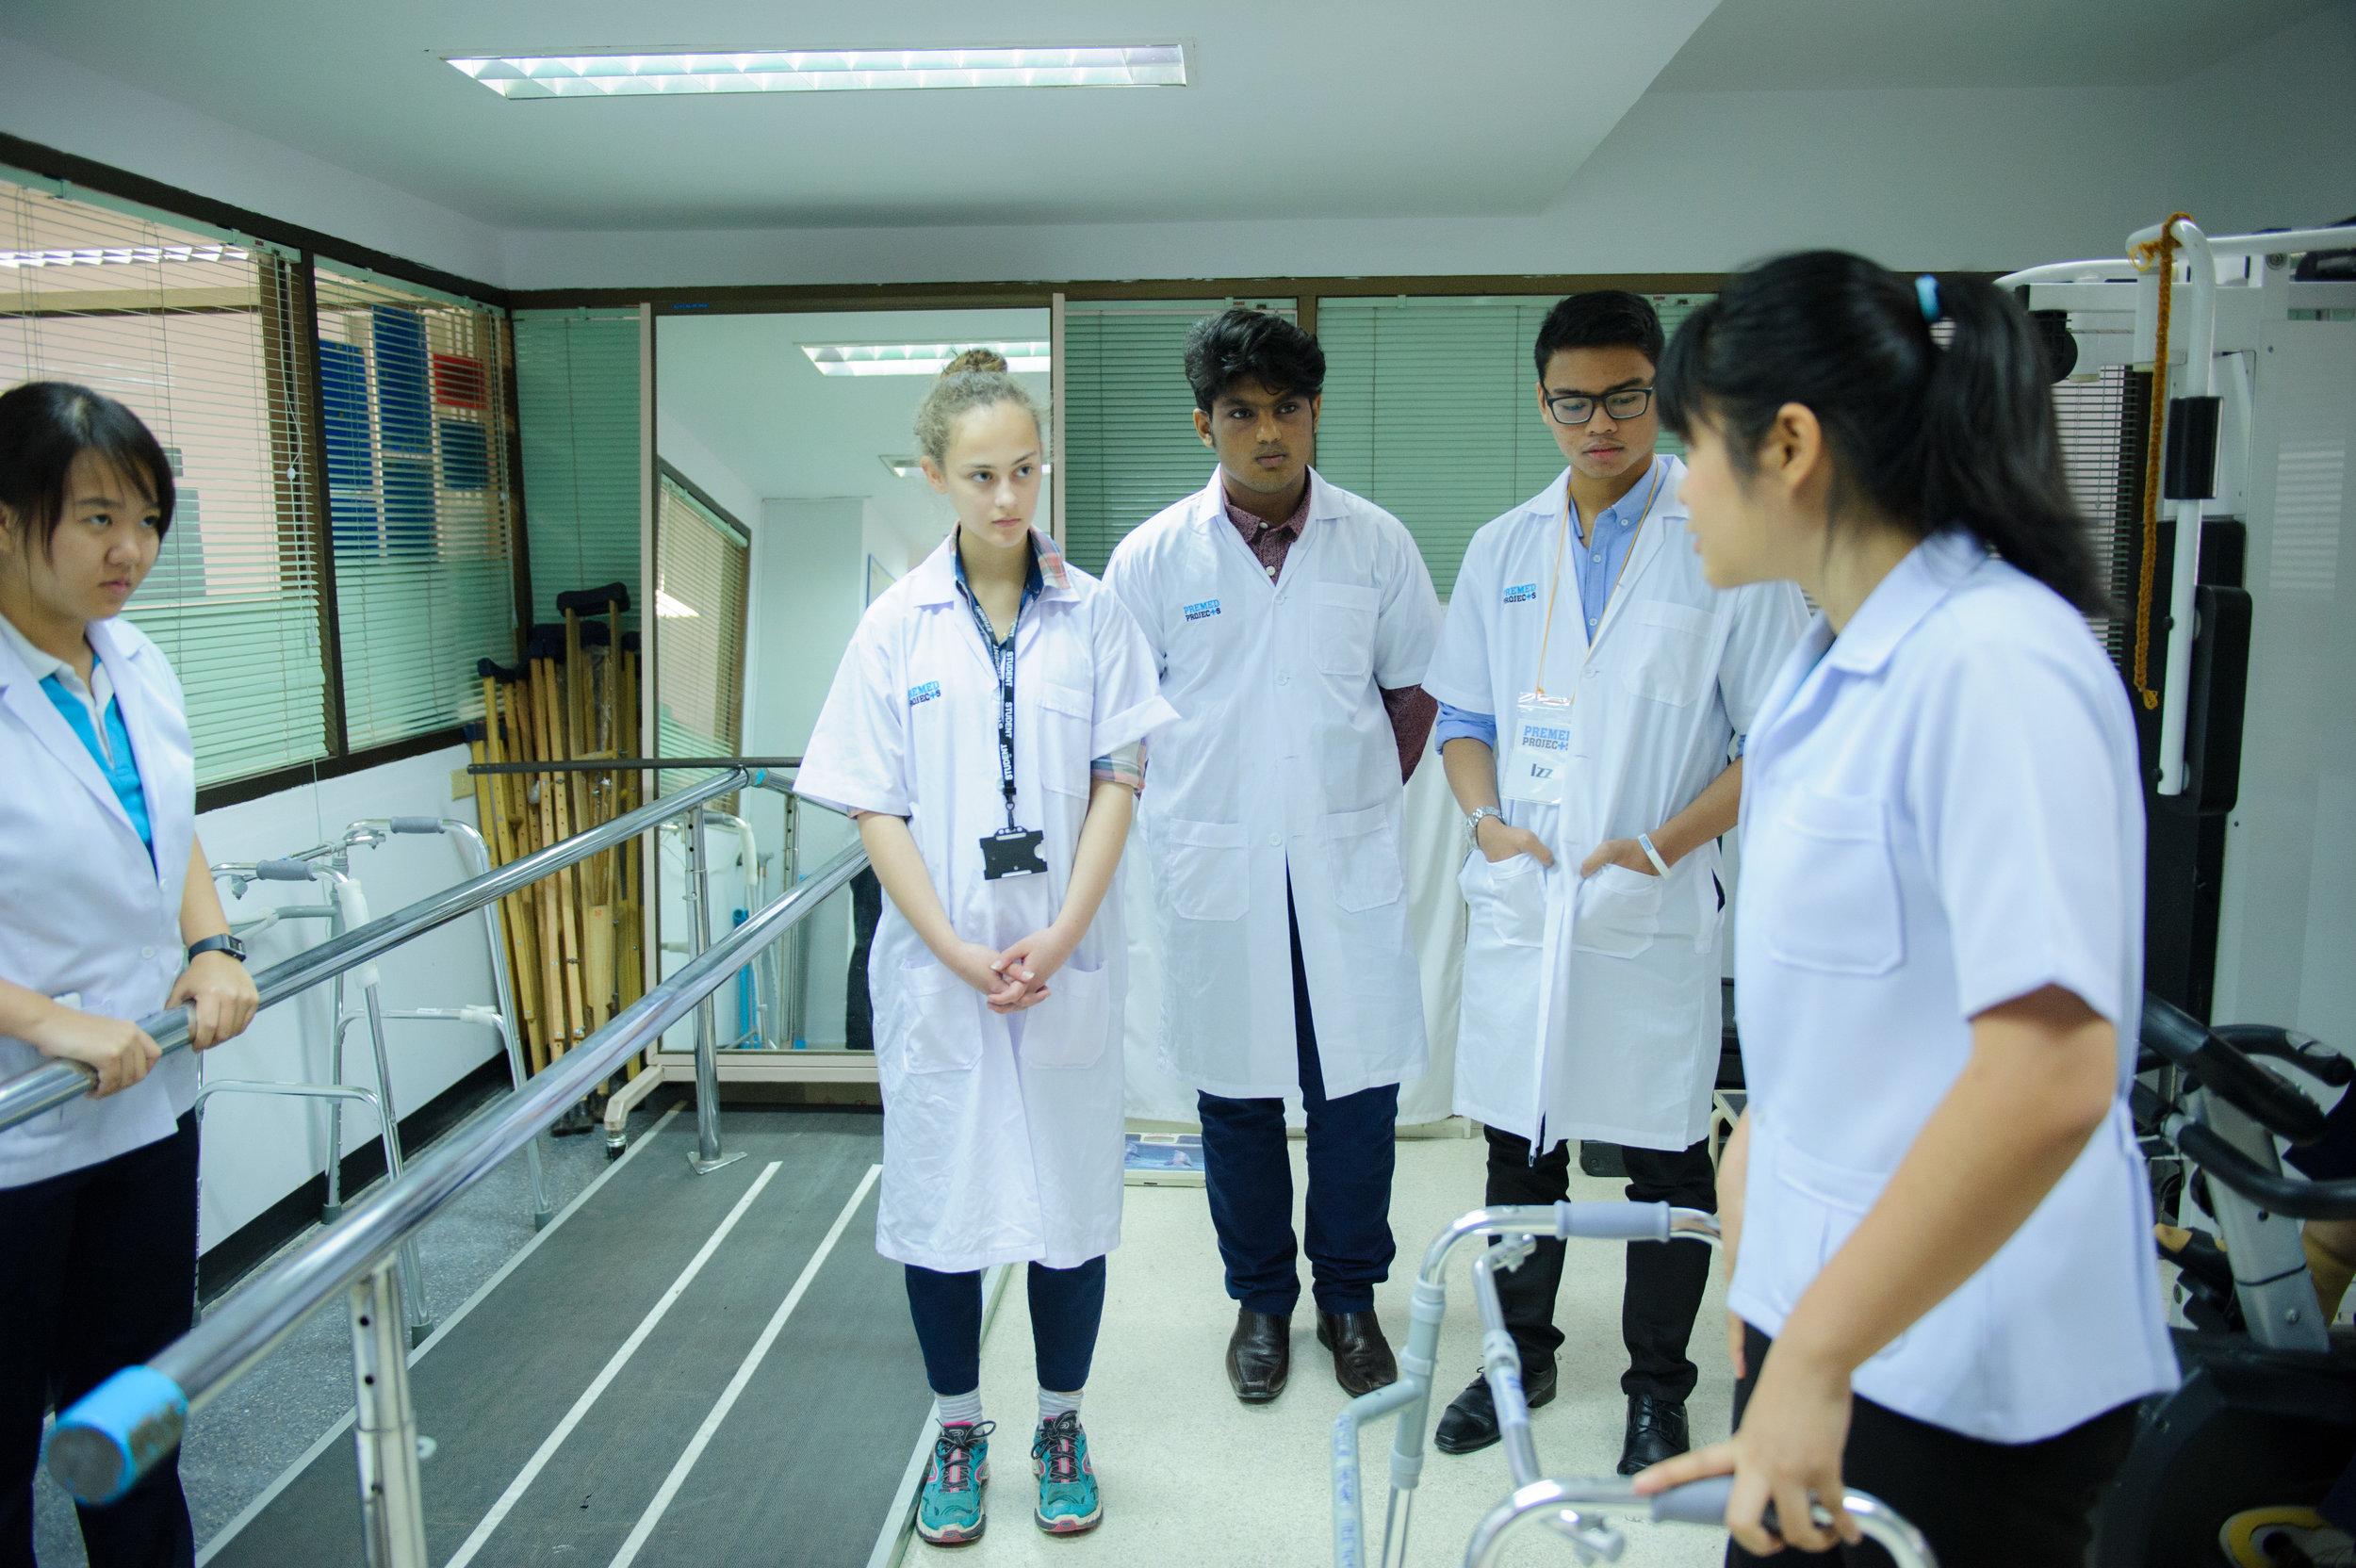 Work Experience in a Hospital.jpg